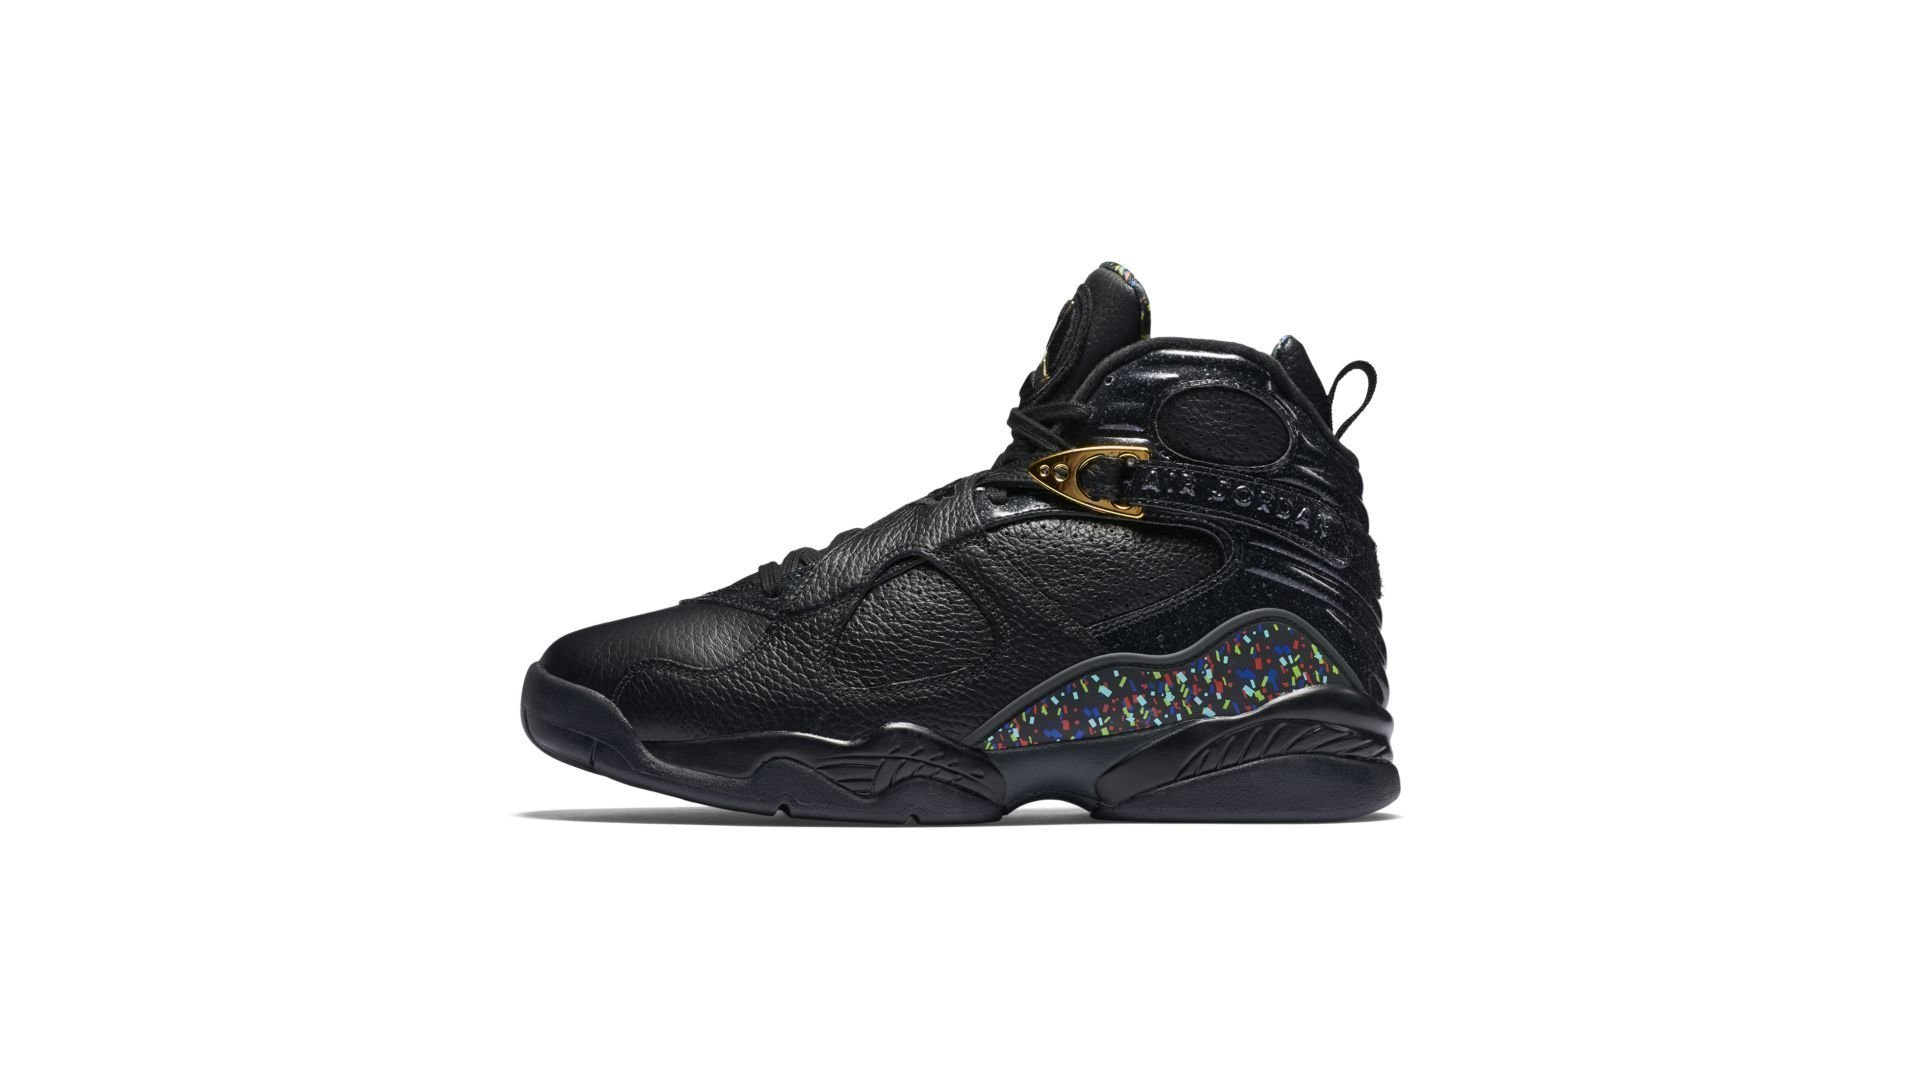 Jordan 8 Retro Confetti (832821-004)